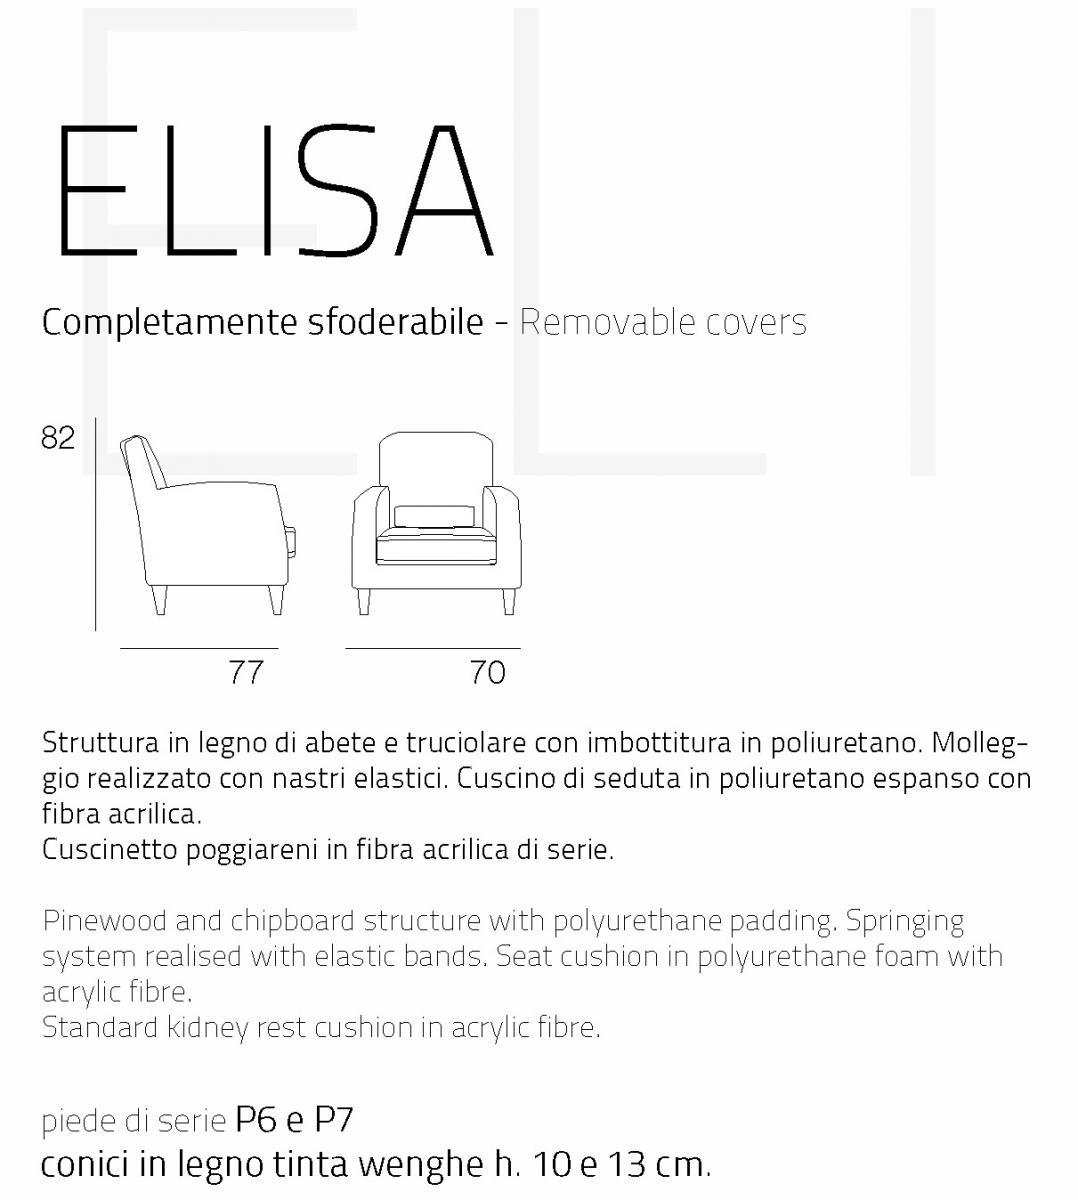 elisa-scheda-tecnica-2